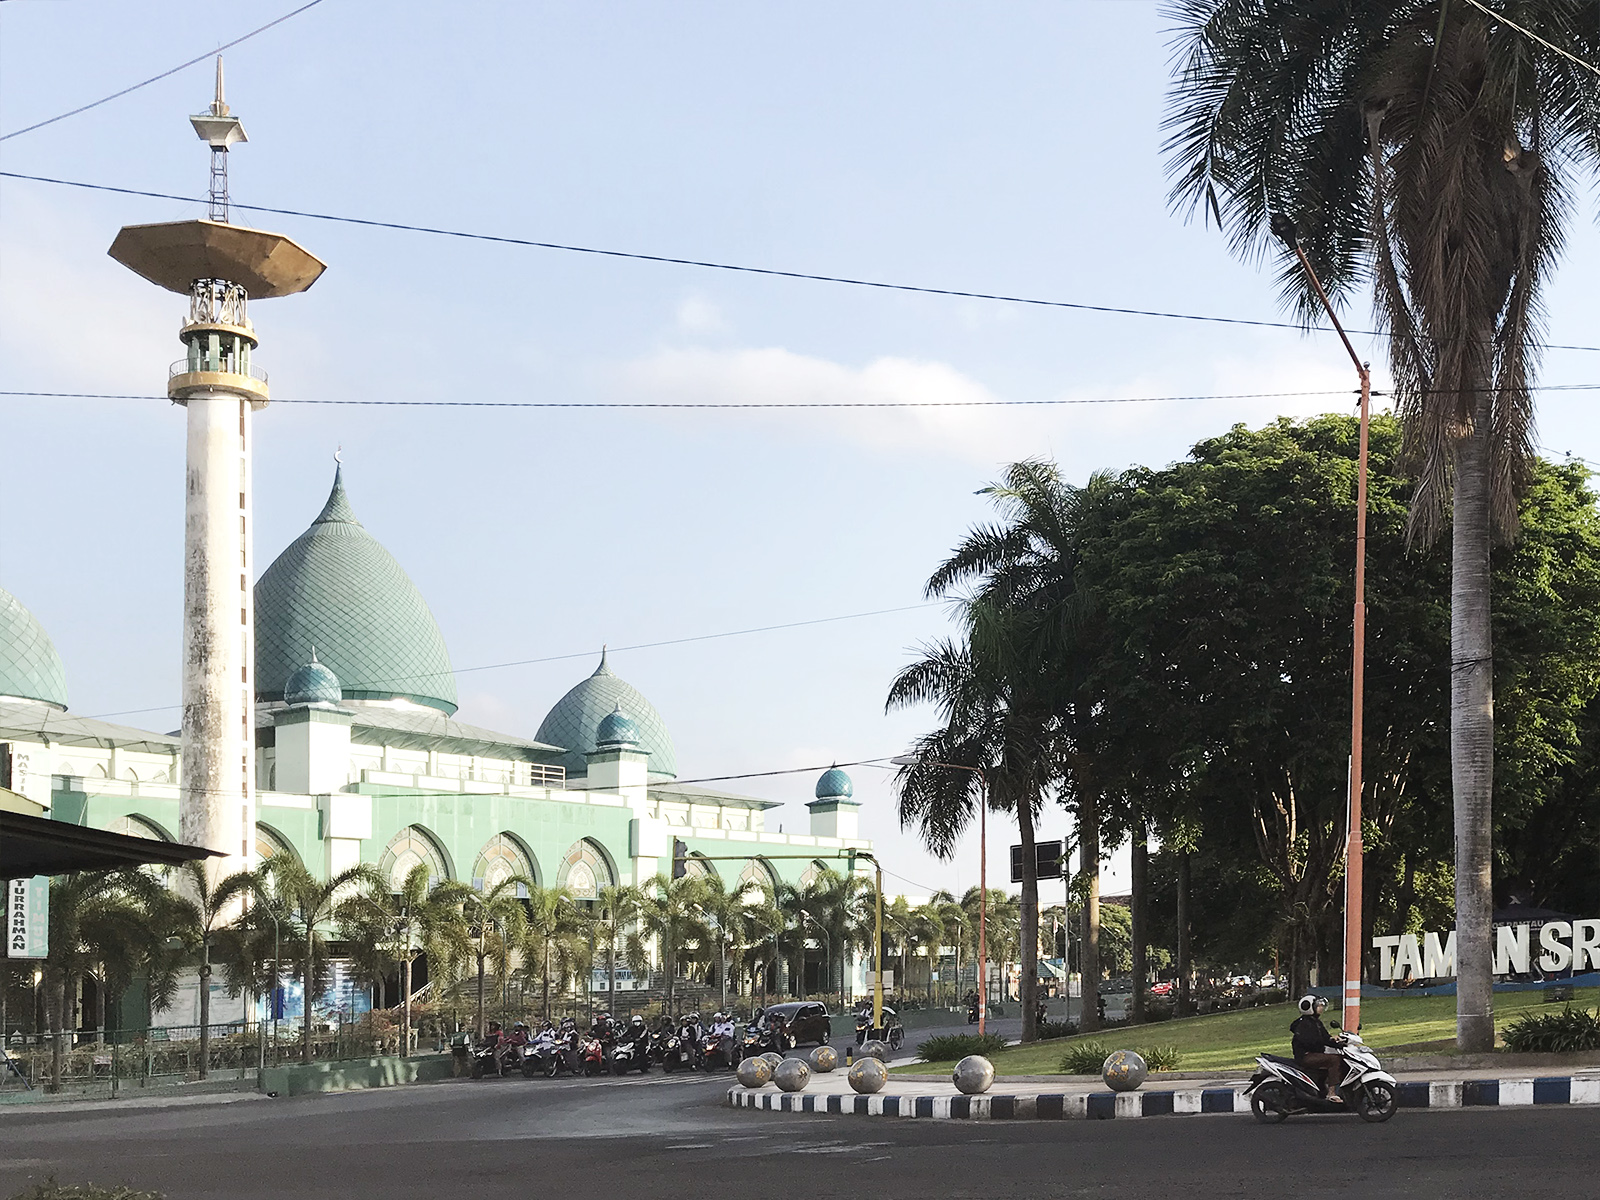 10 JAWA - Jawa: wulkan Ijen, Bromo, Yogyakarta i świątynie